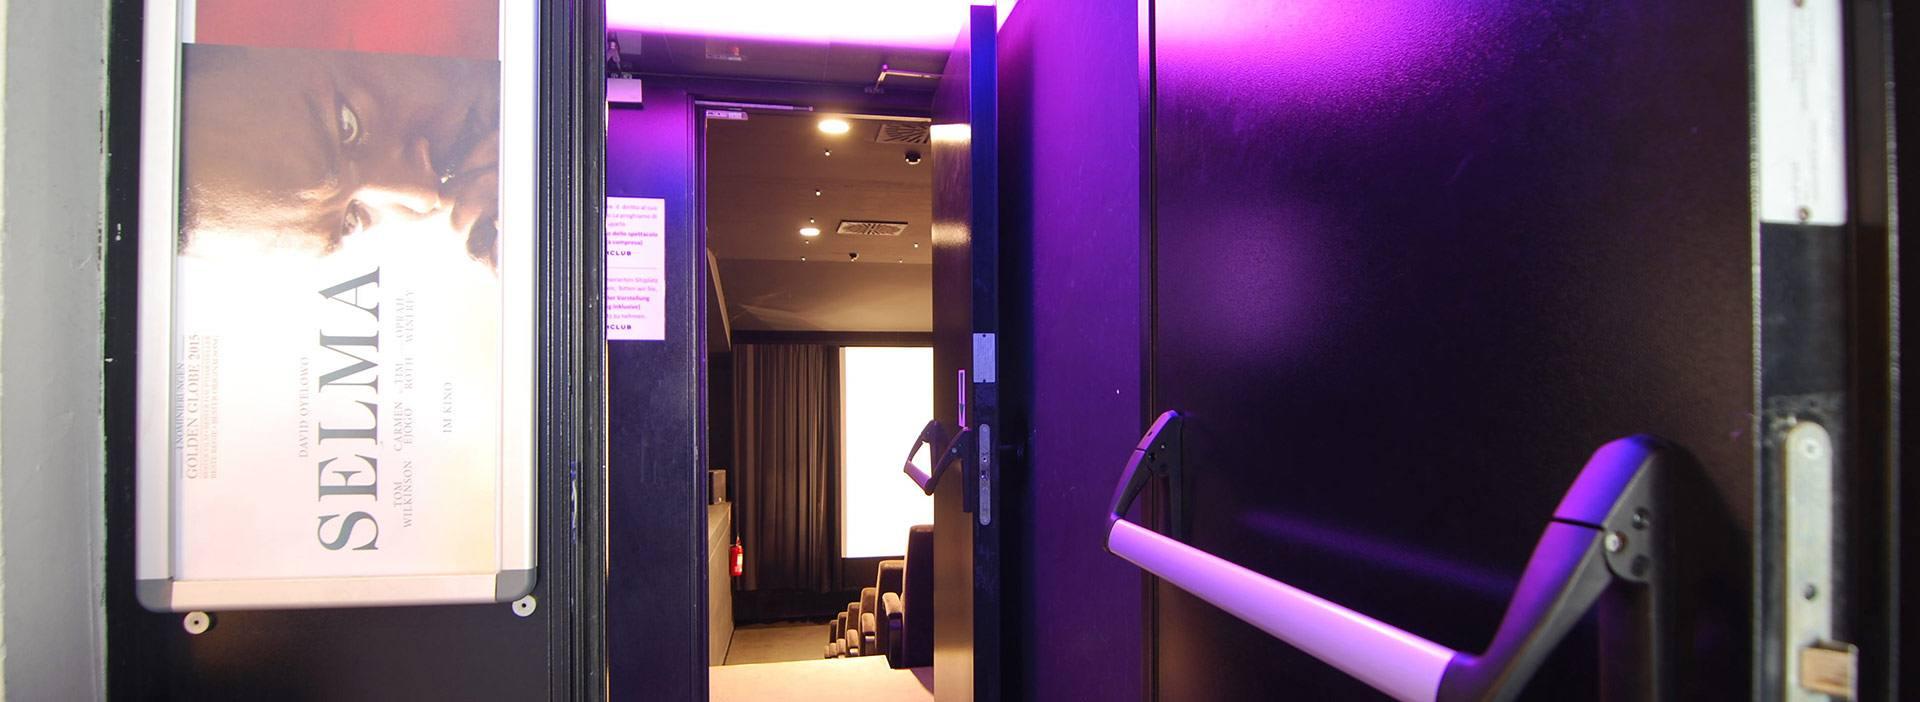 Filmclub – Capitolkino Bozen